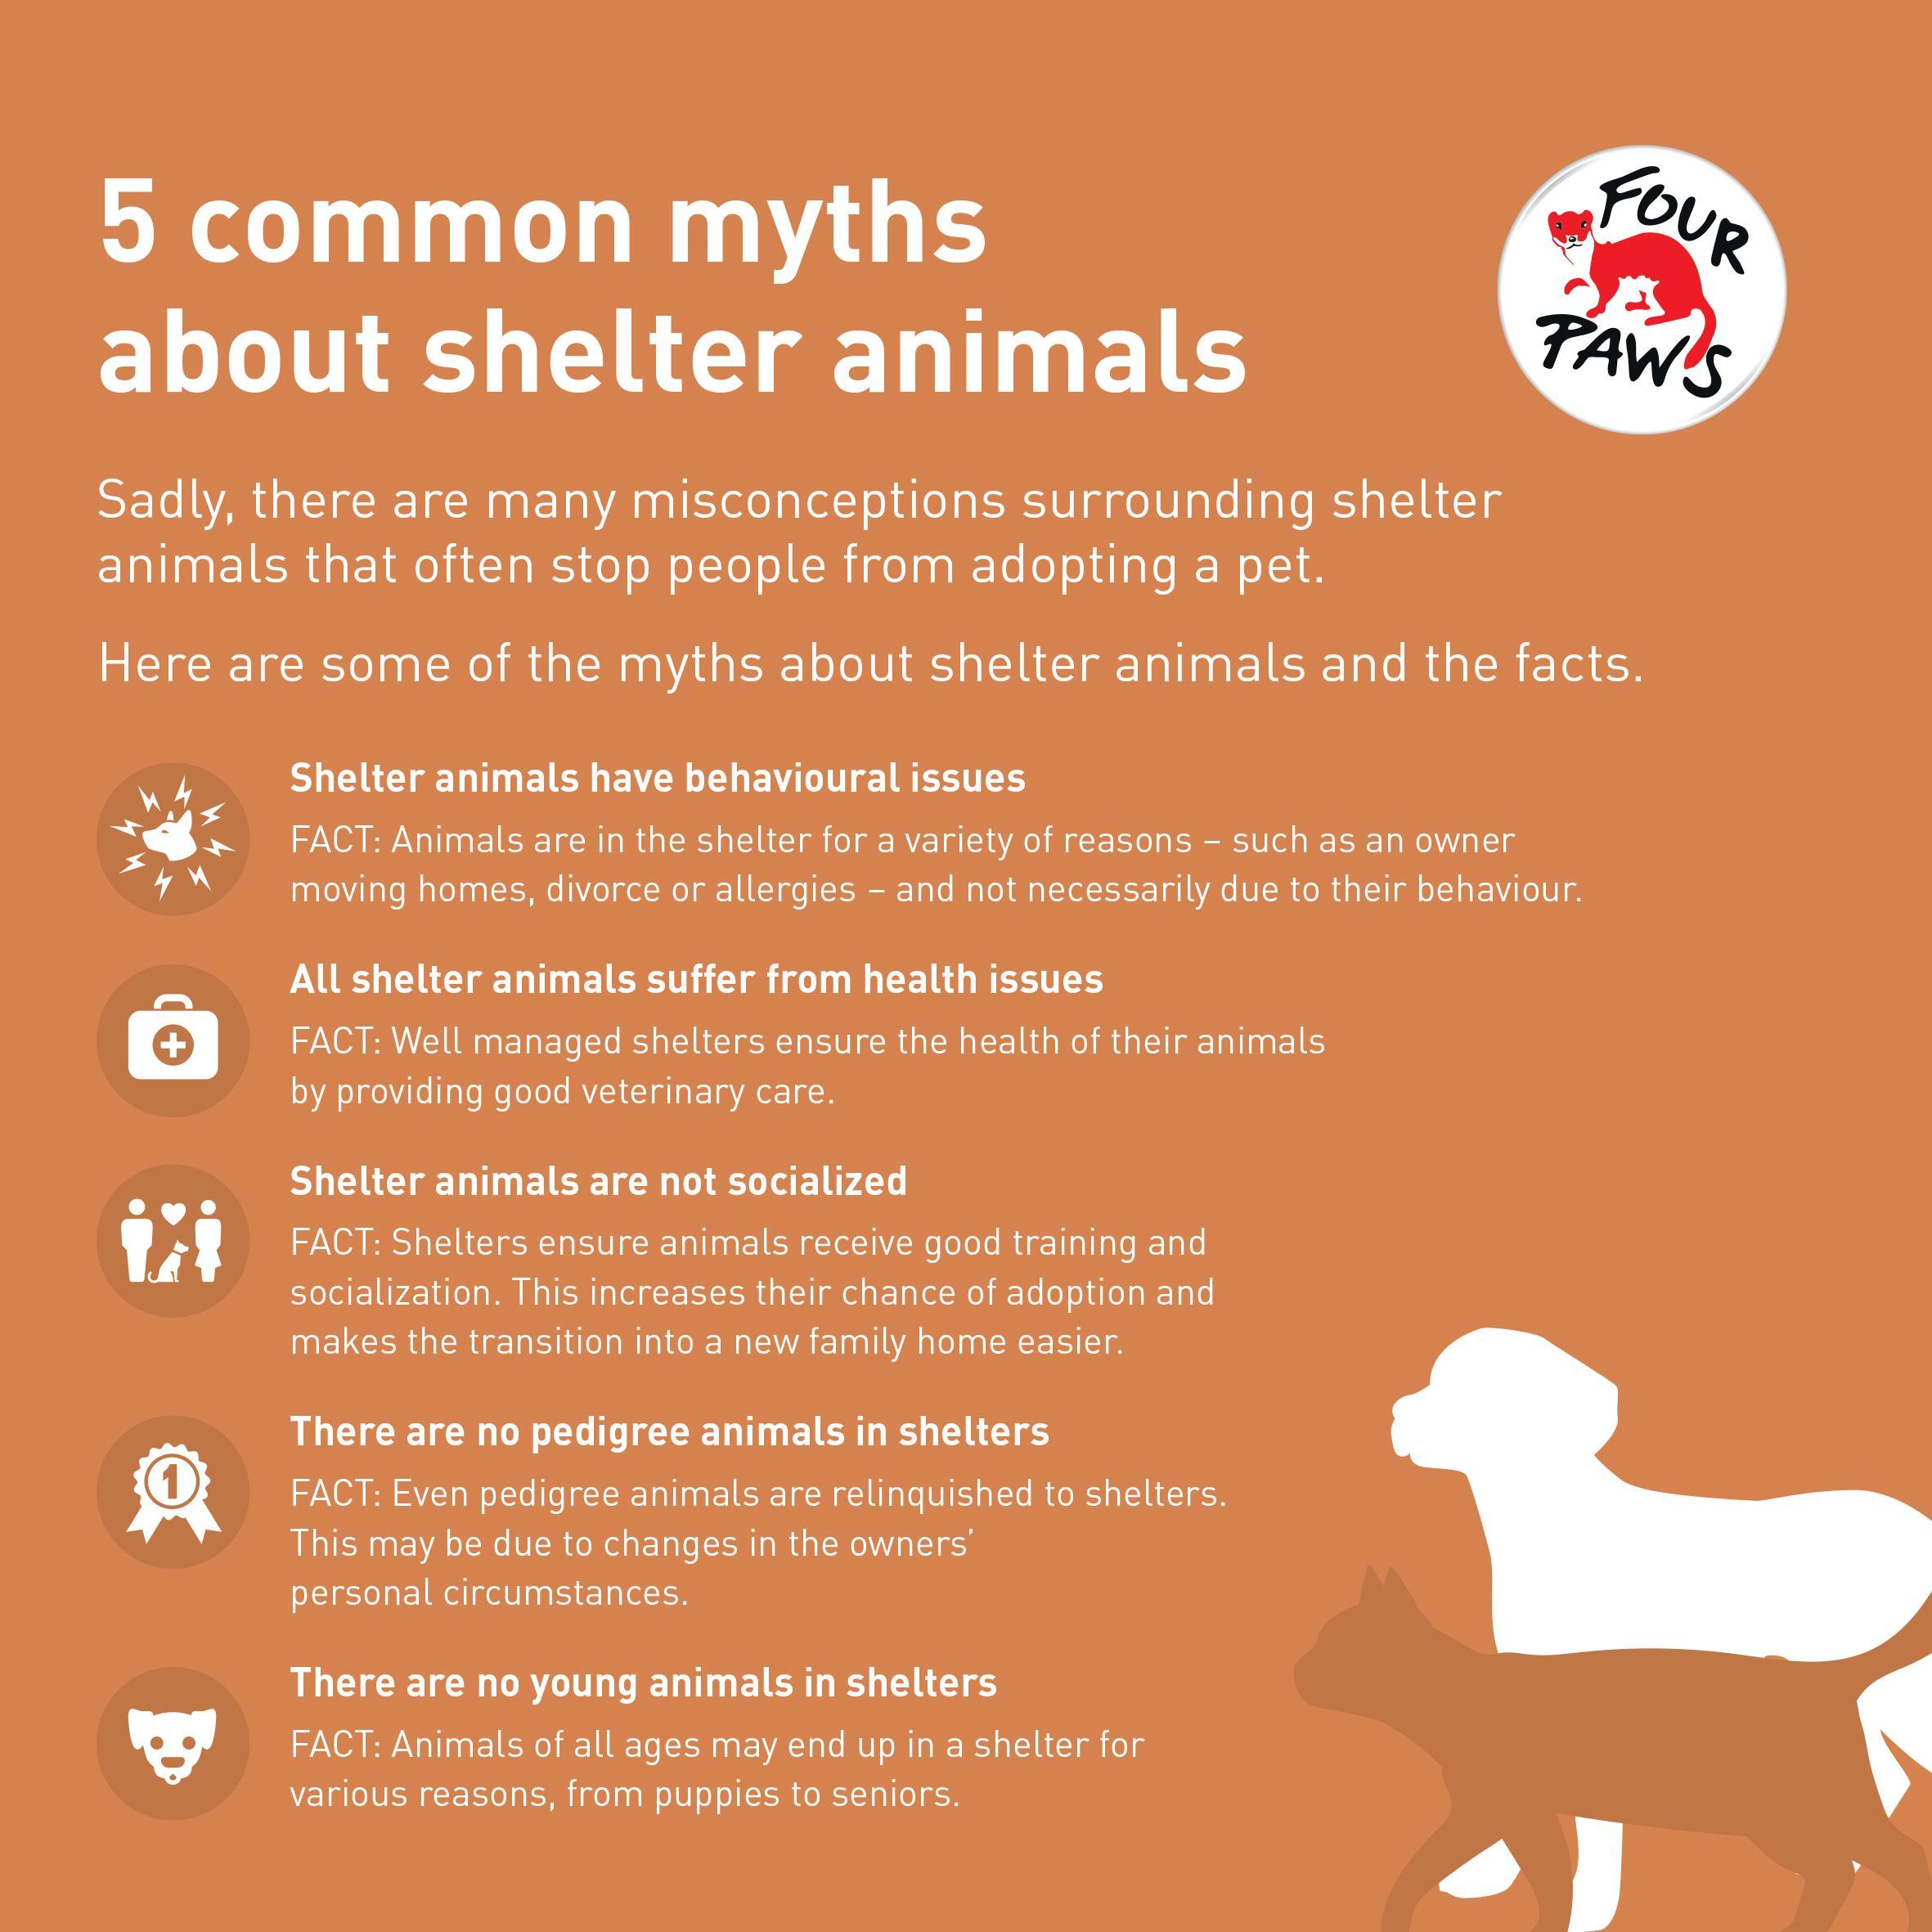 Animal shelter myths Infographic